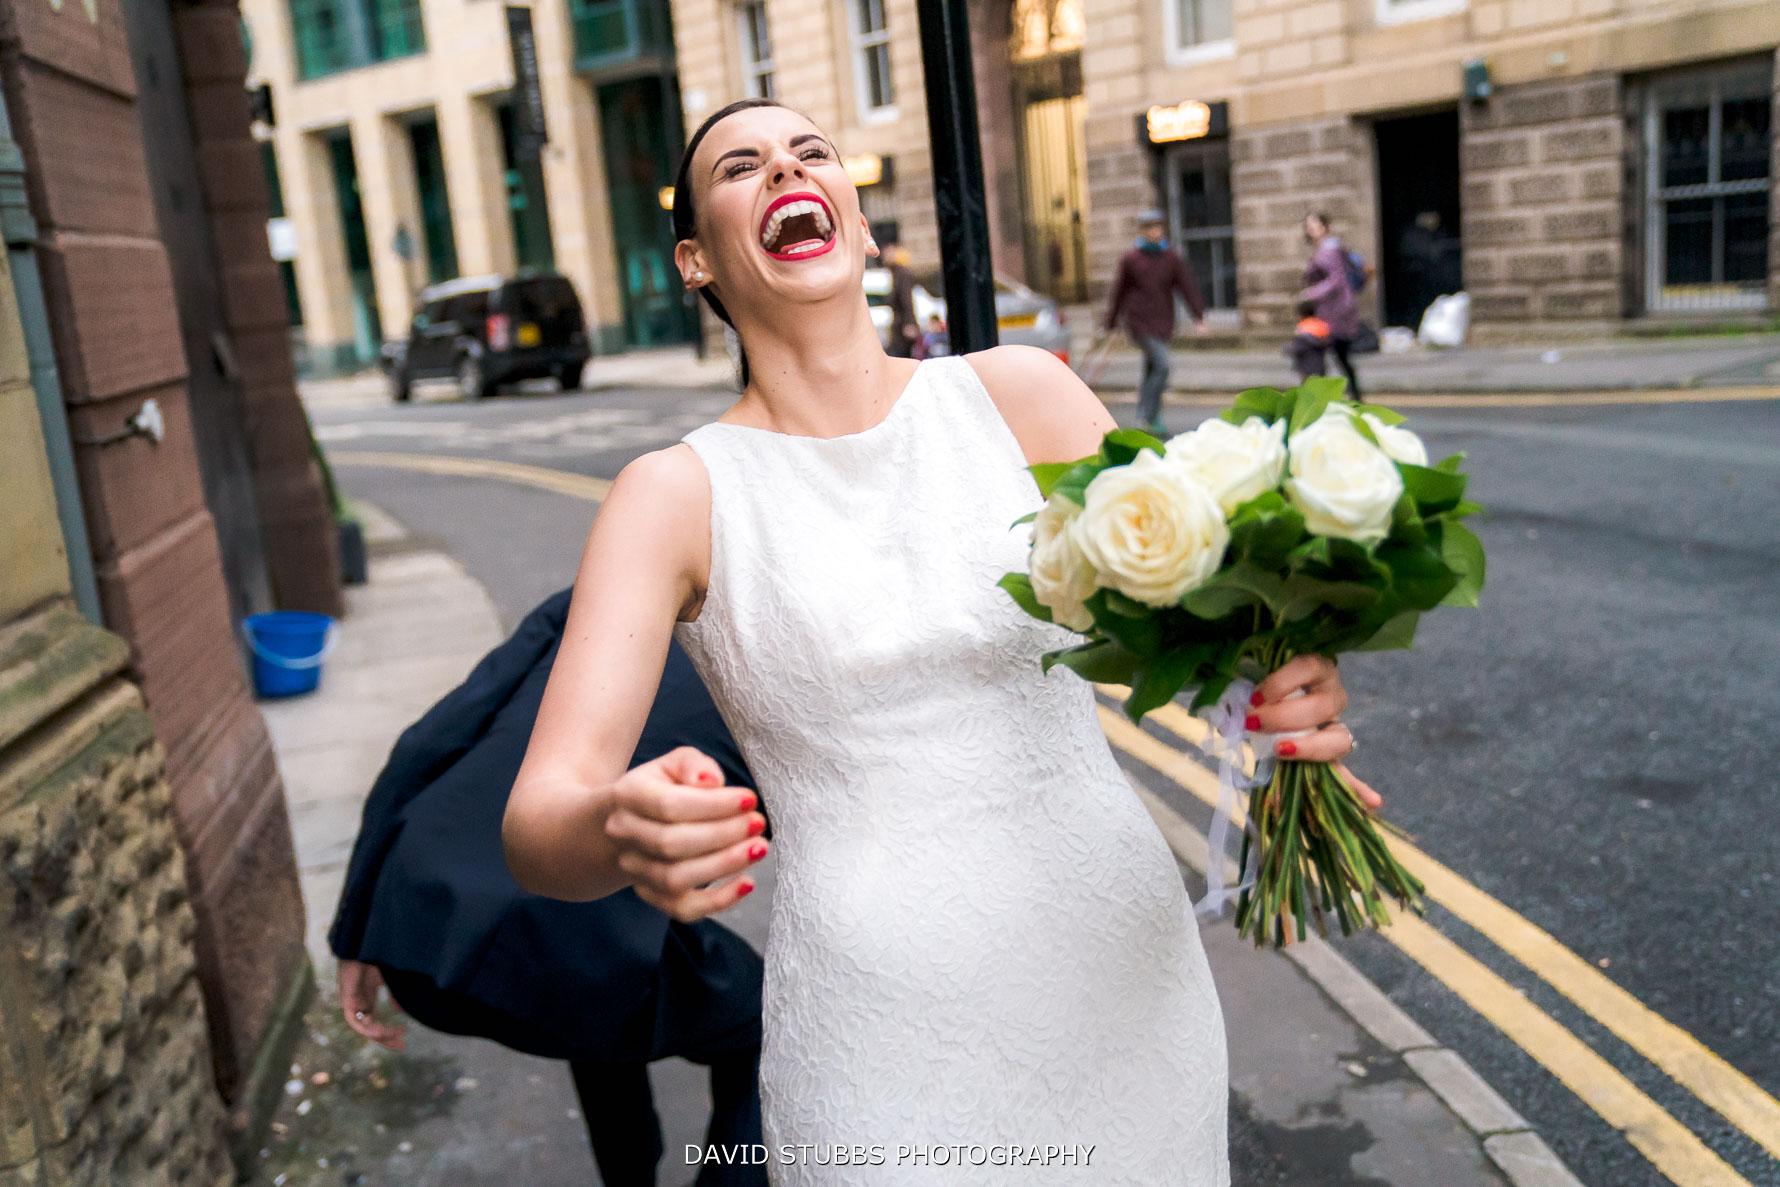 dress caught on the street